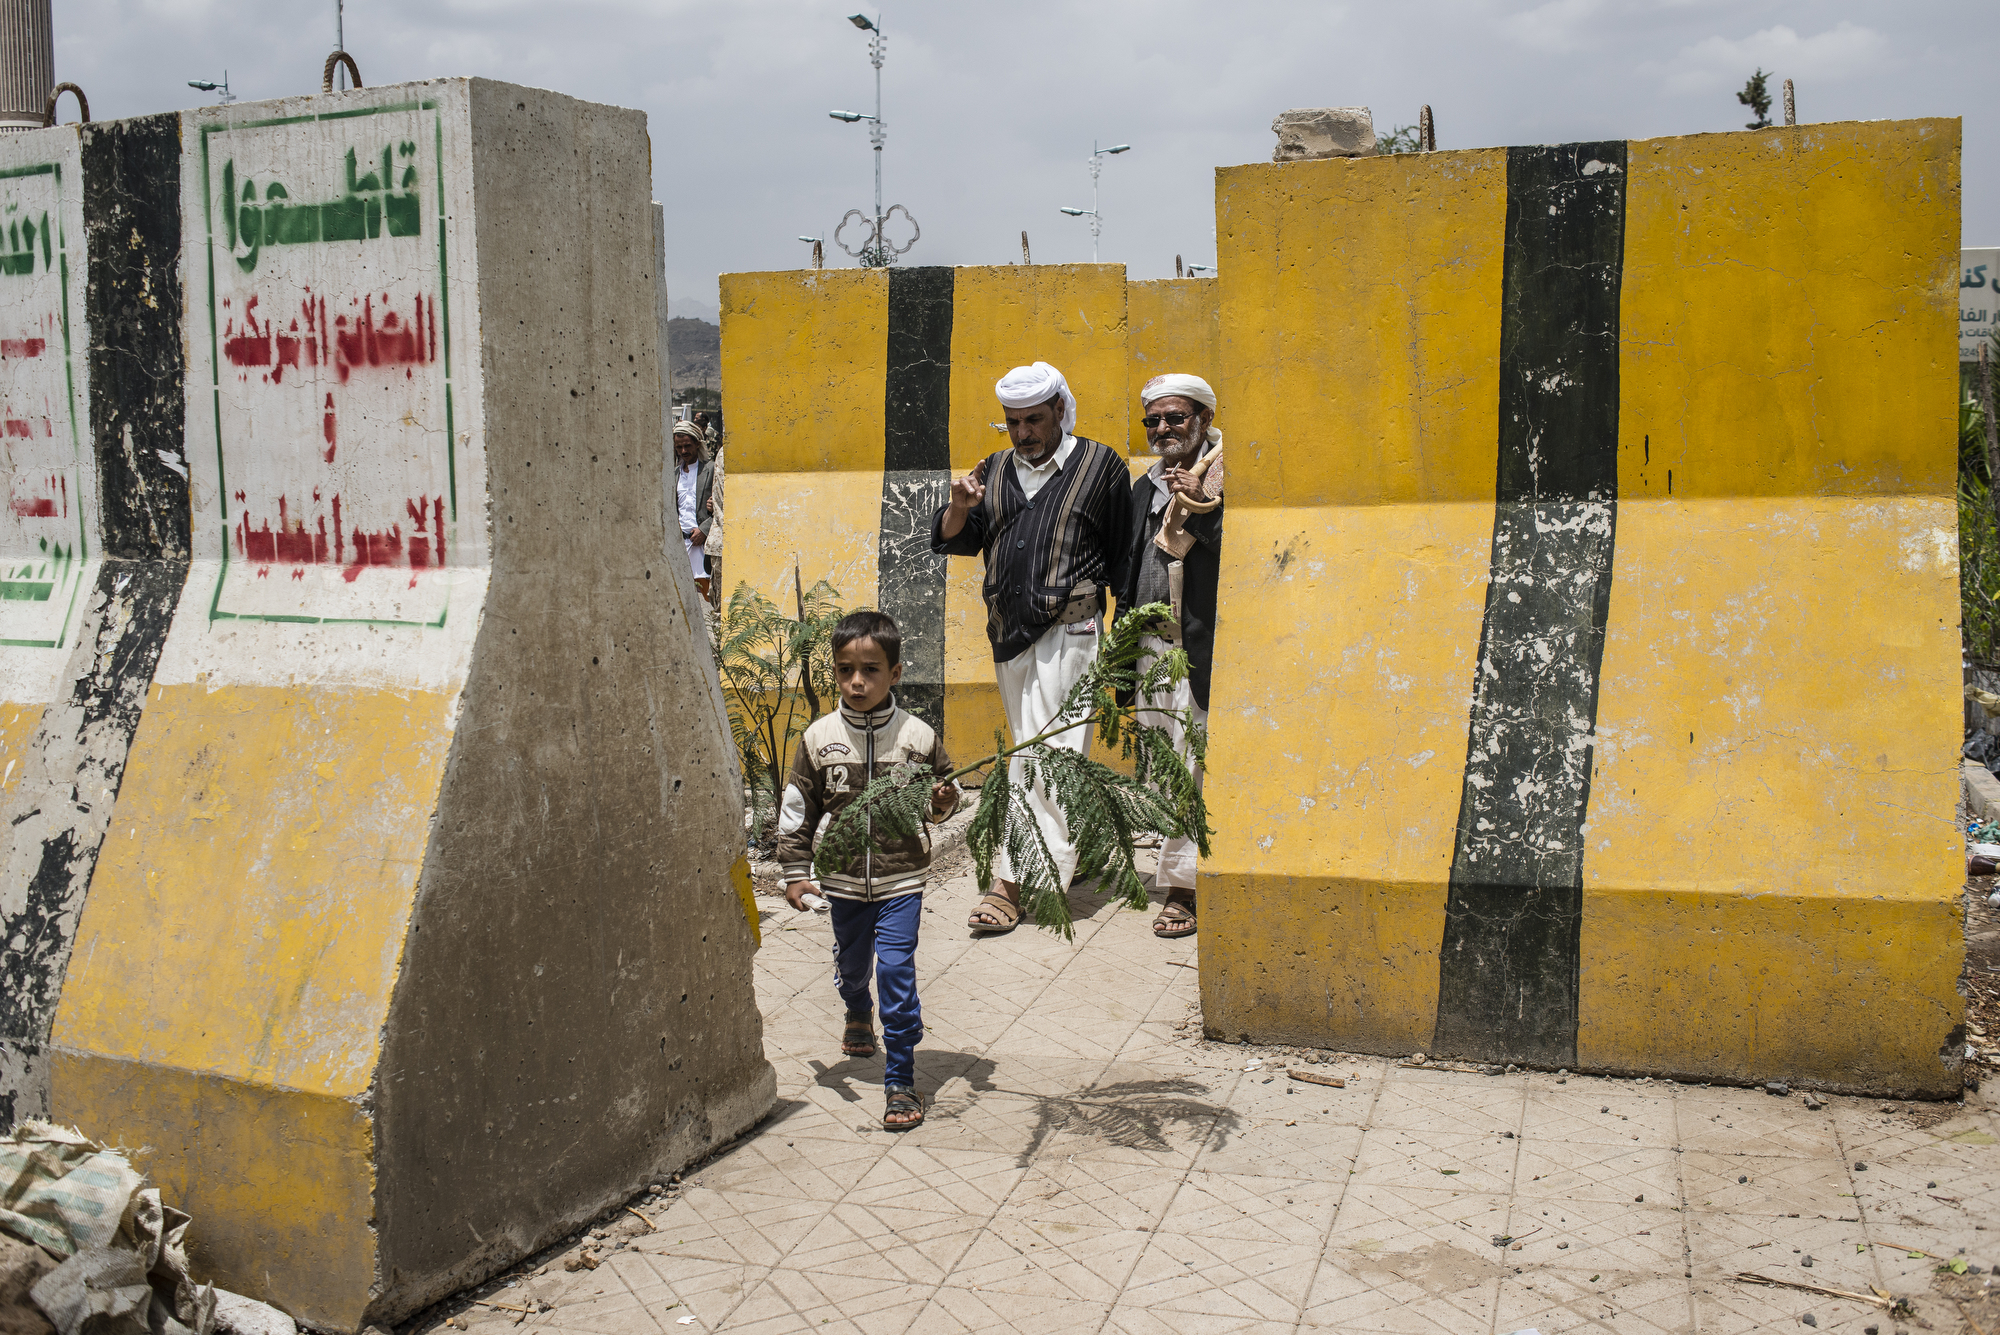 AlexPotter_Yemen_InterceptHealth_ContextPhotos_25.JPG